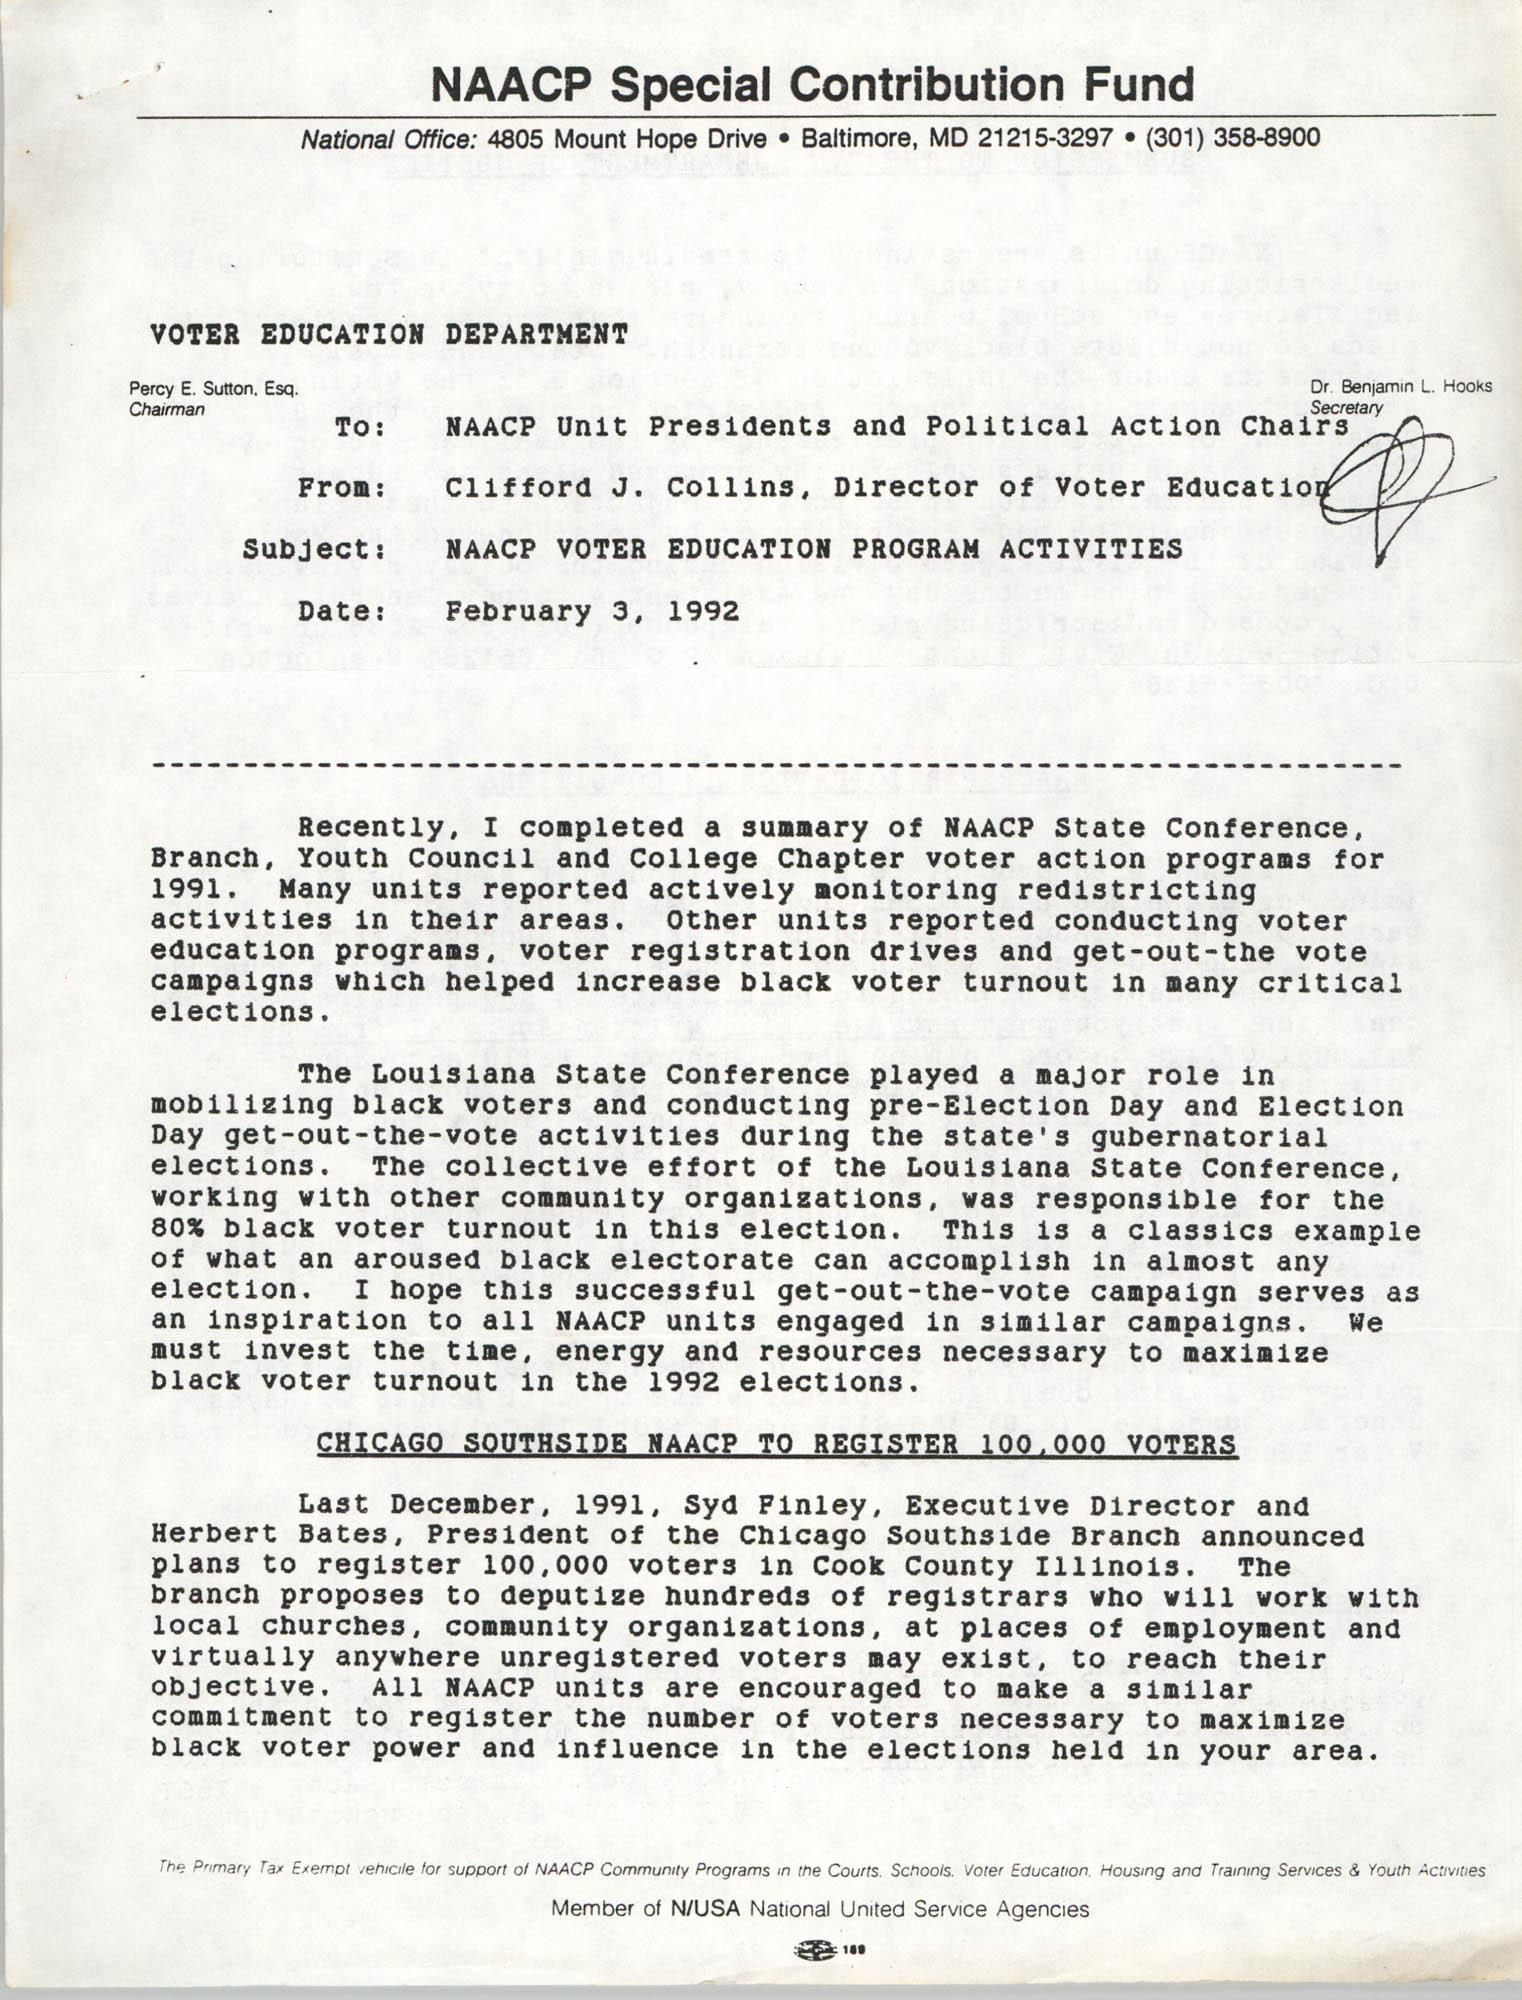 Memorandum, Clifford J. Collins, February 3, 1992